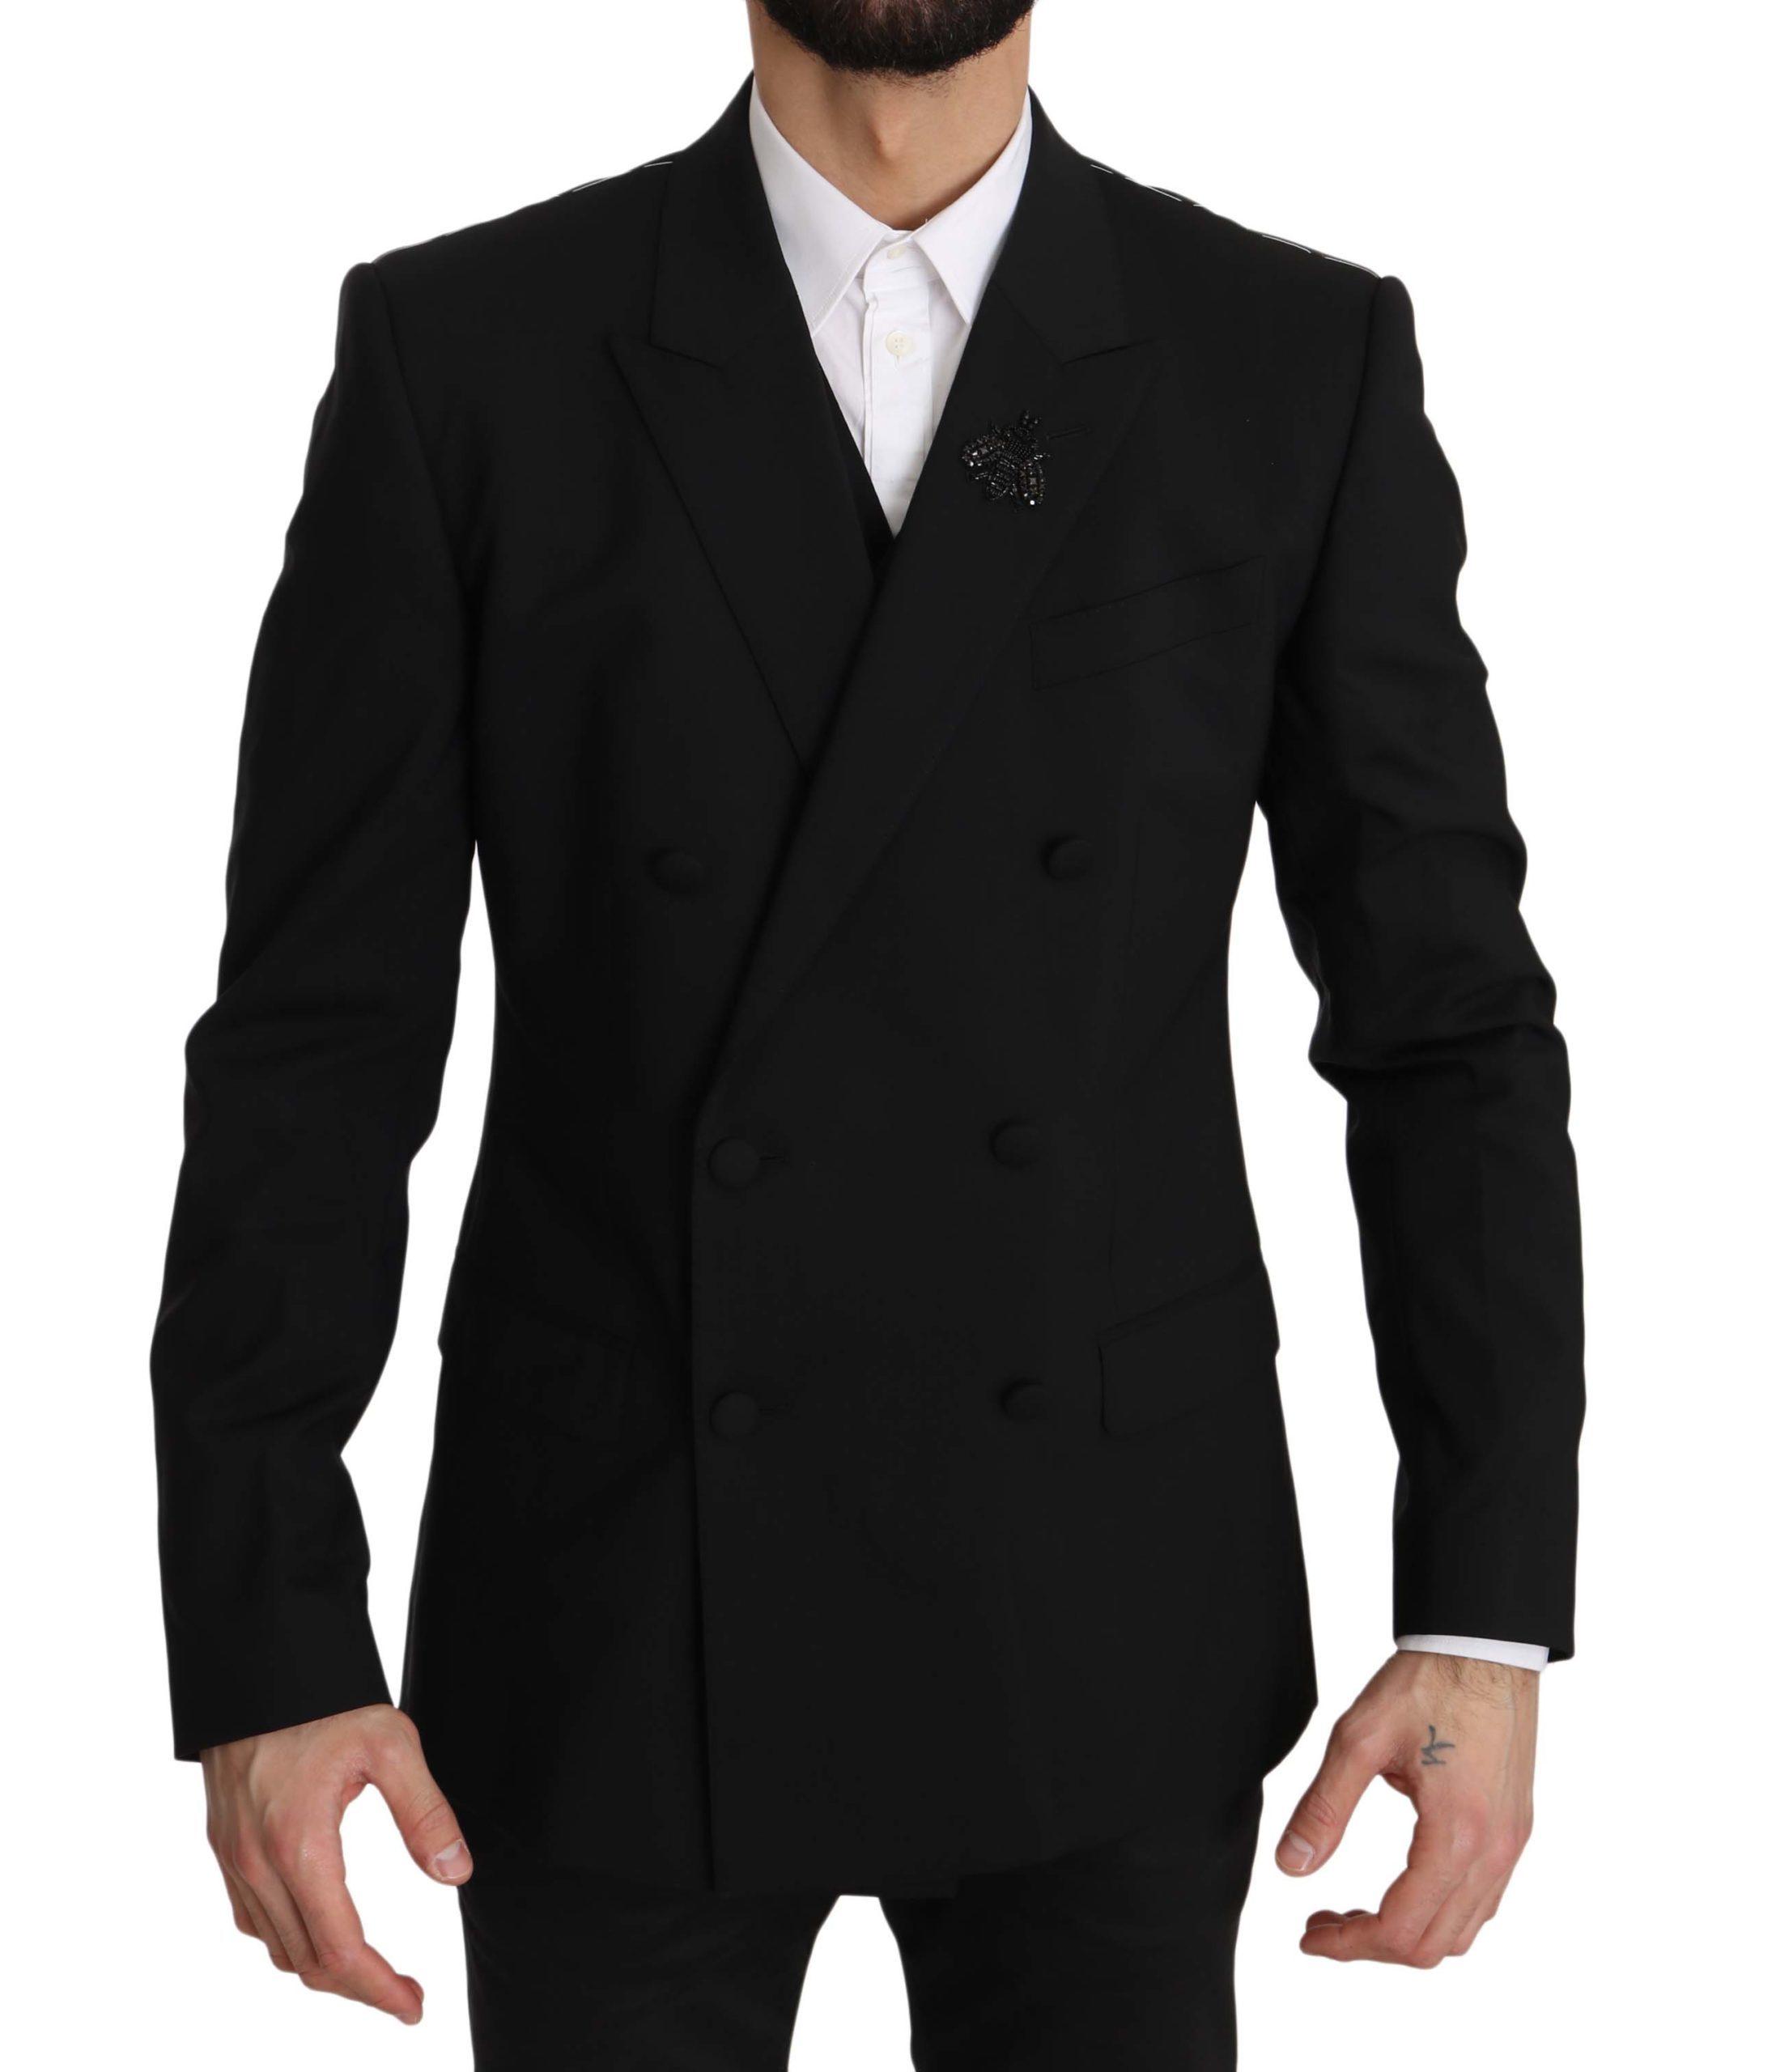 Dolce & Gabbana Men's Blazer Black JKT2383 - IT50   L